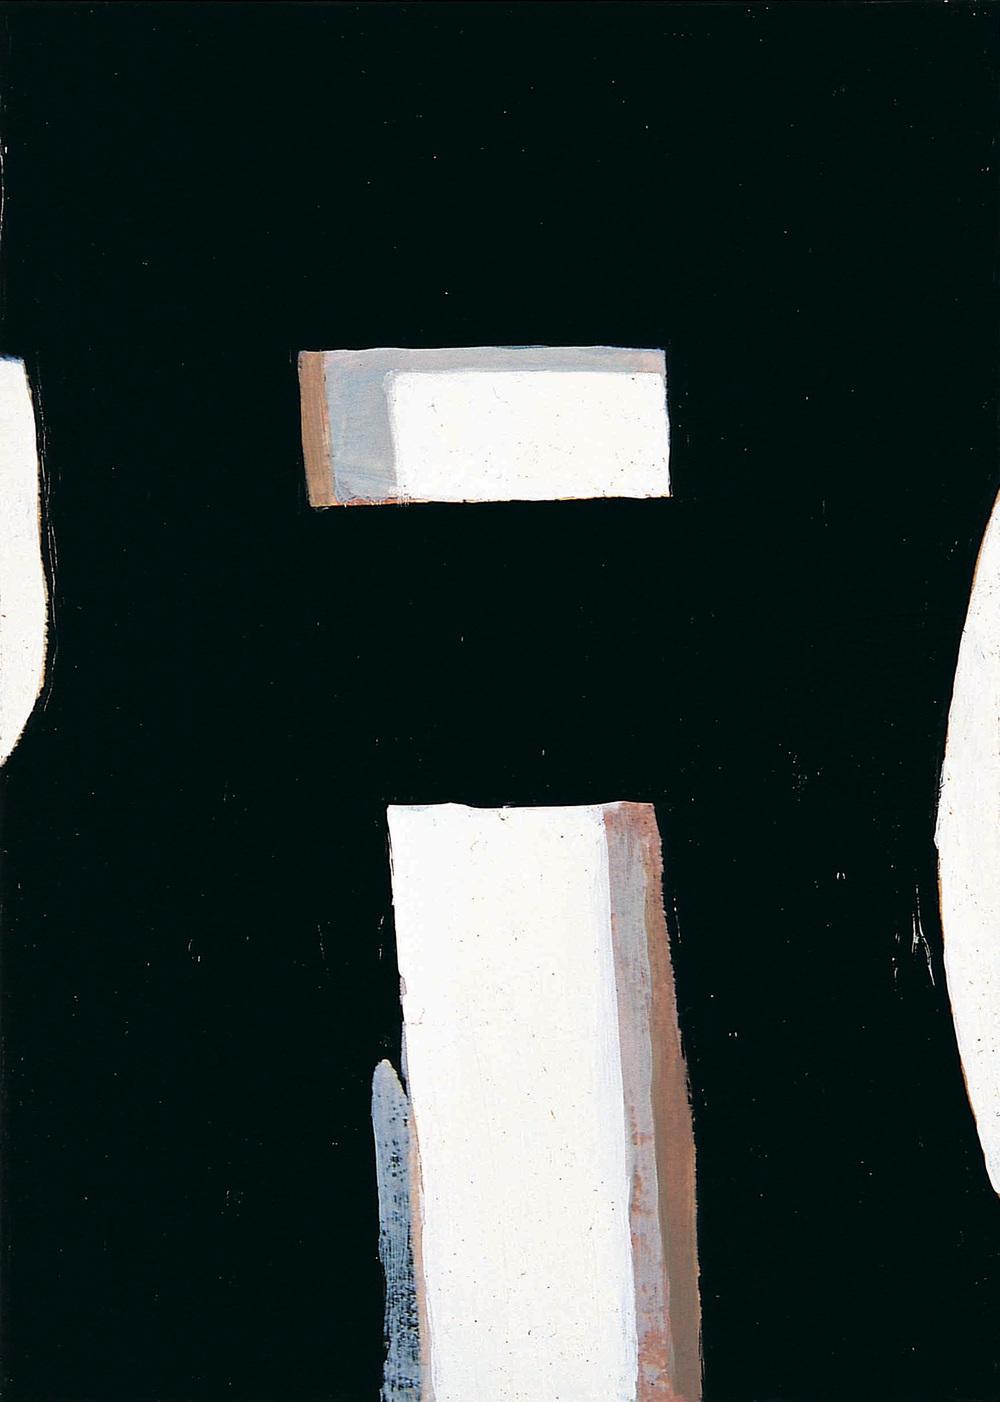 Liam Belton_-_Mondschein II_oil on paper_17.5 x 12.5cm.jpg